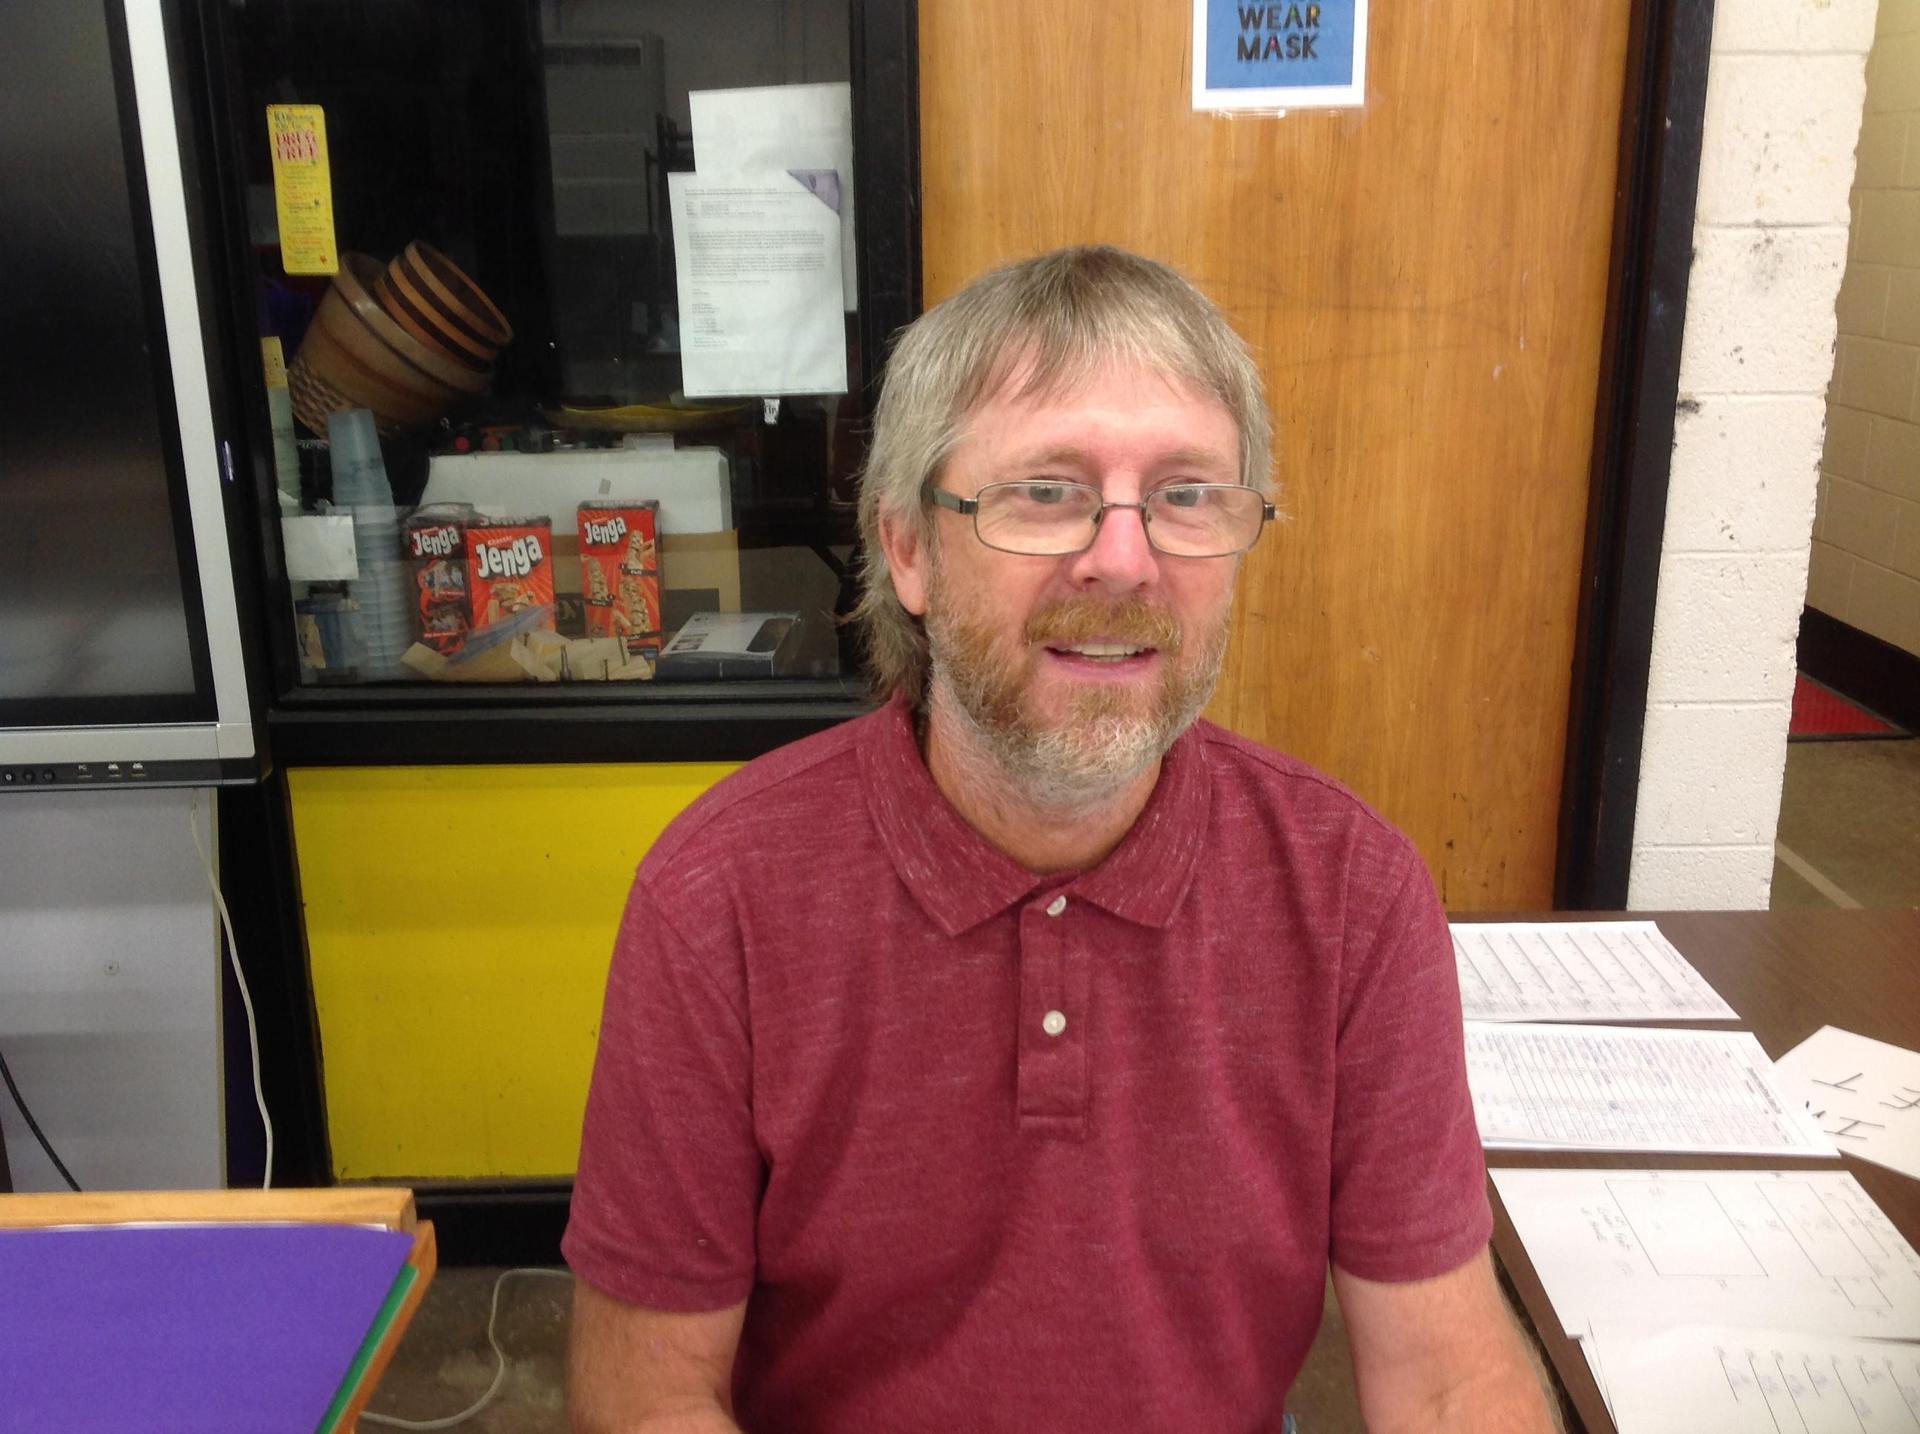 Mr. Rauton